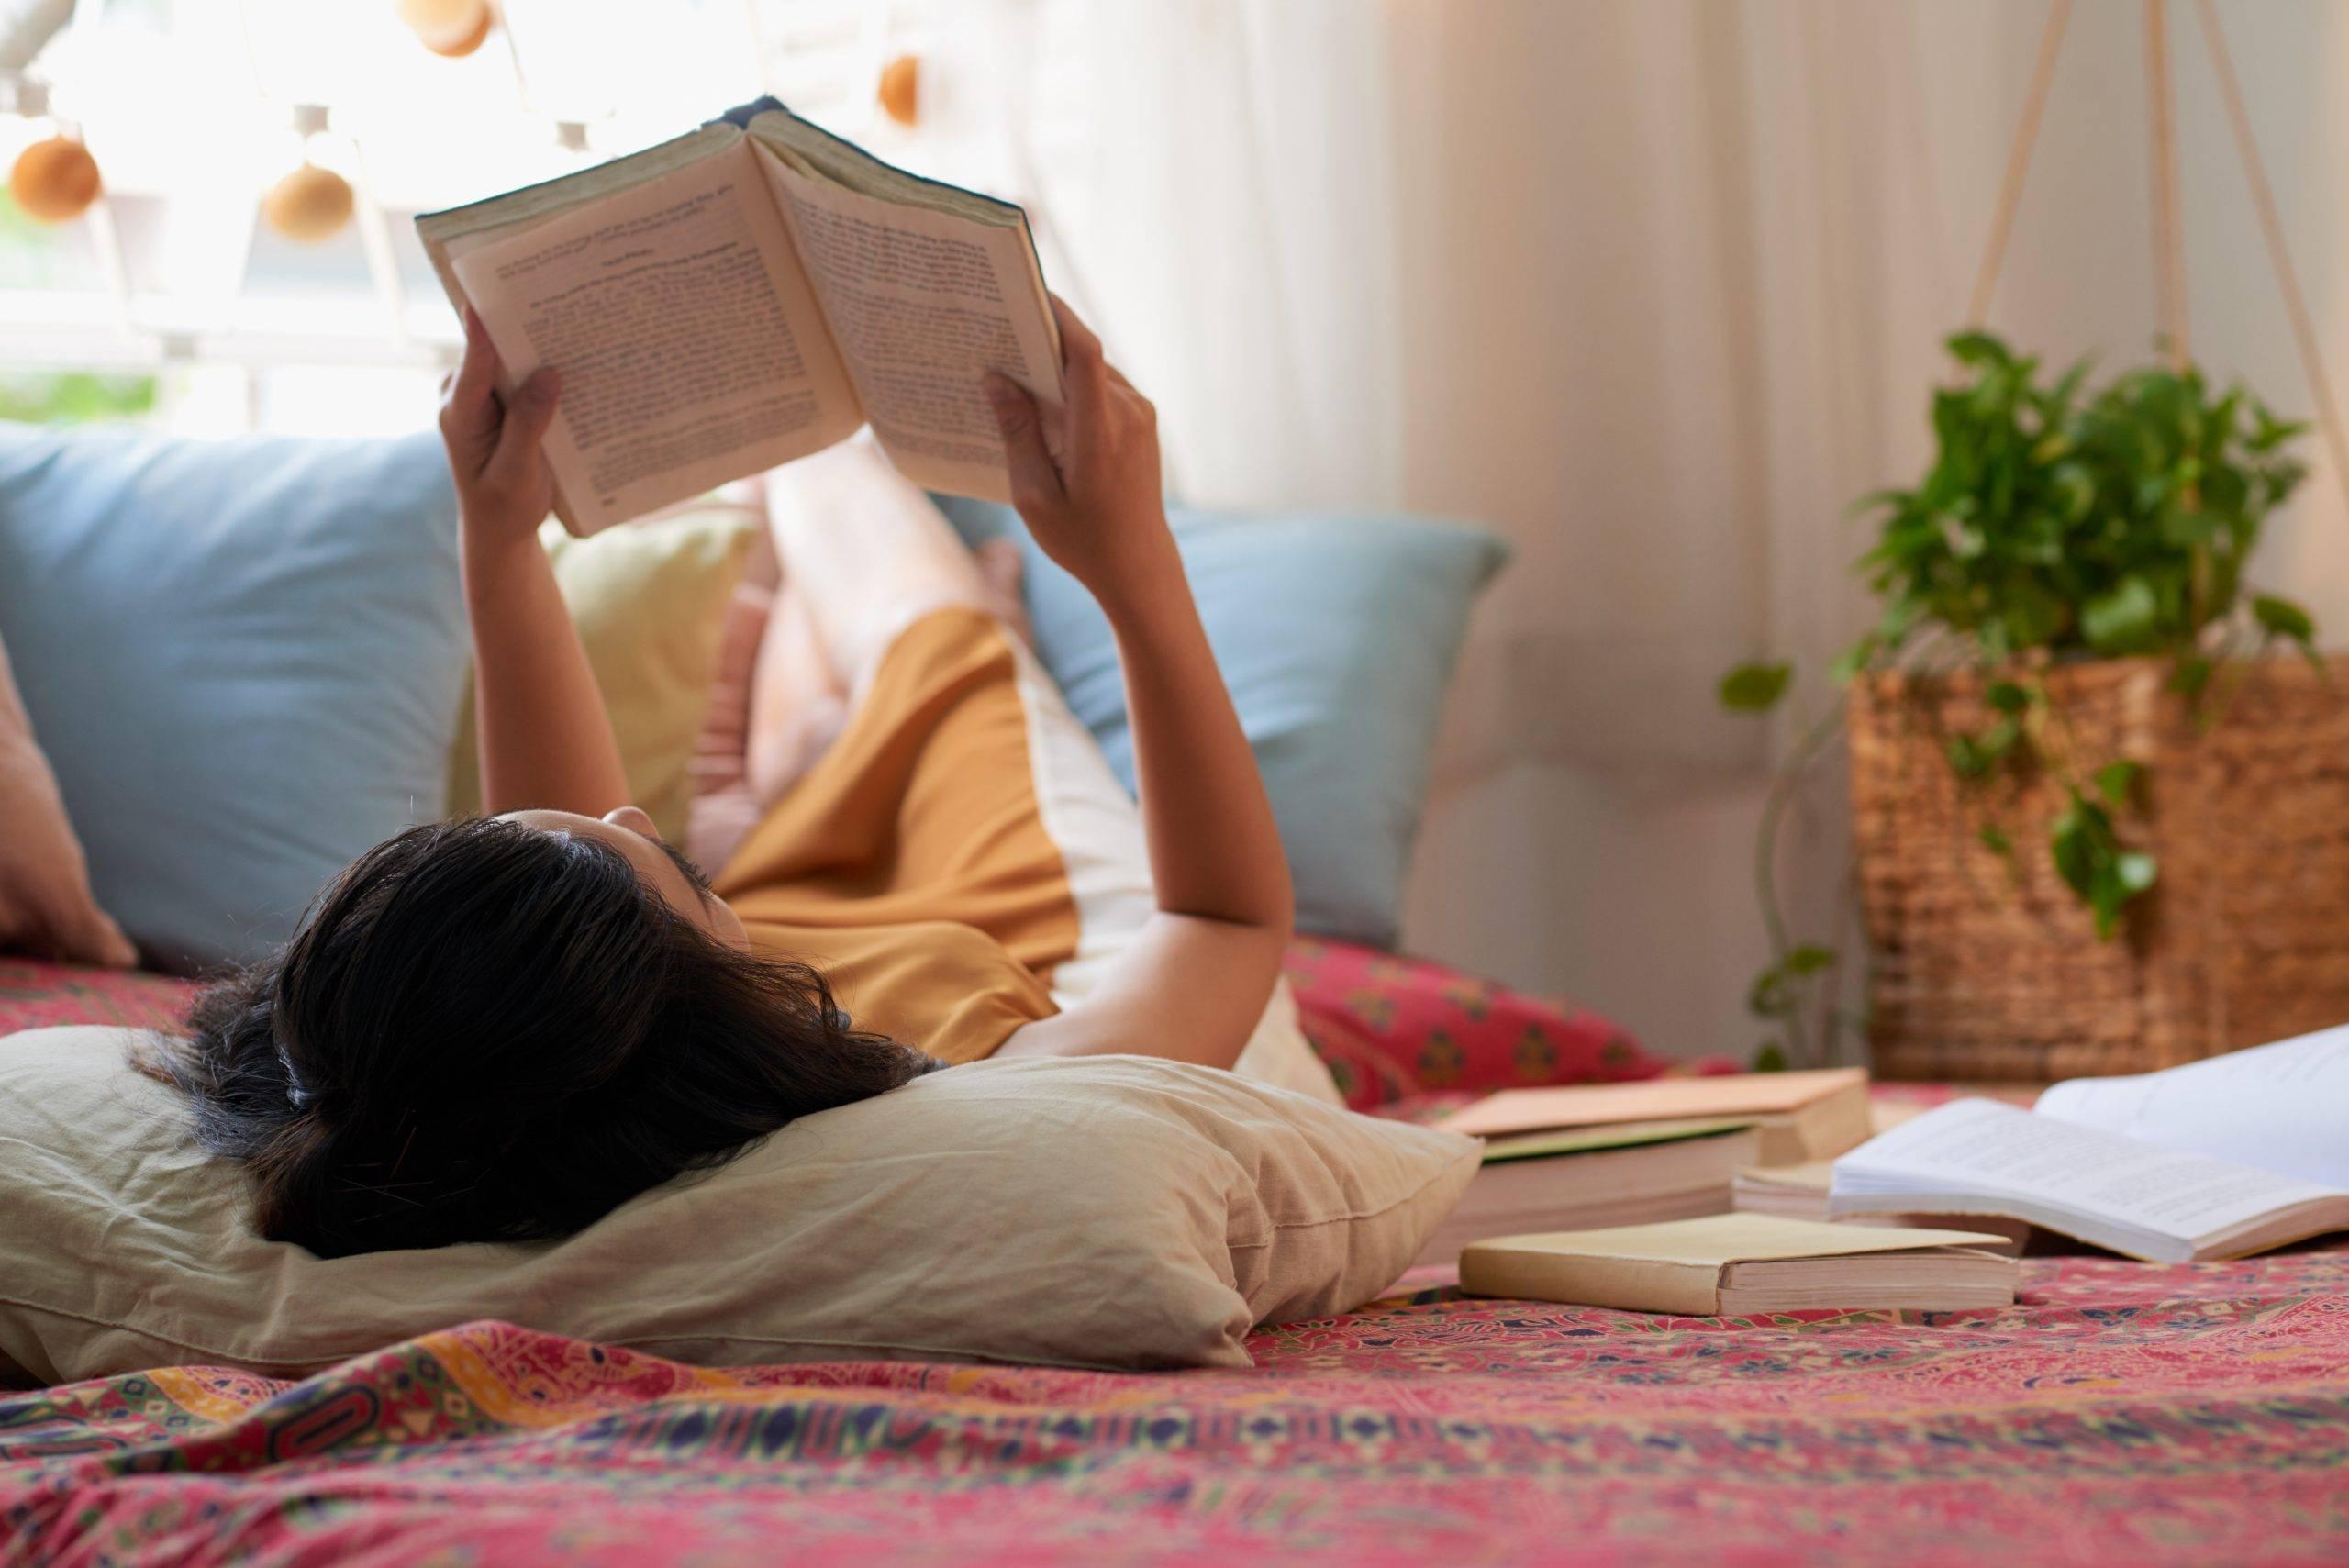 спокойствие, почивка, повече удобство, уют, мансарда